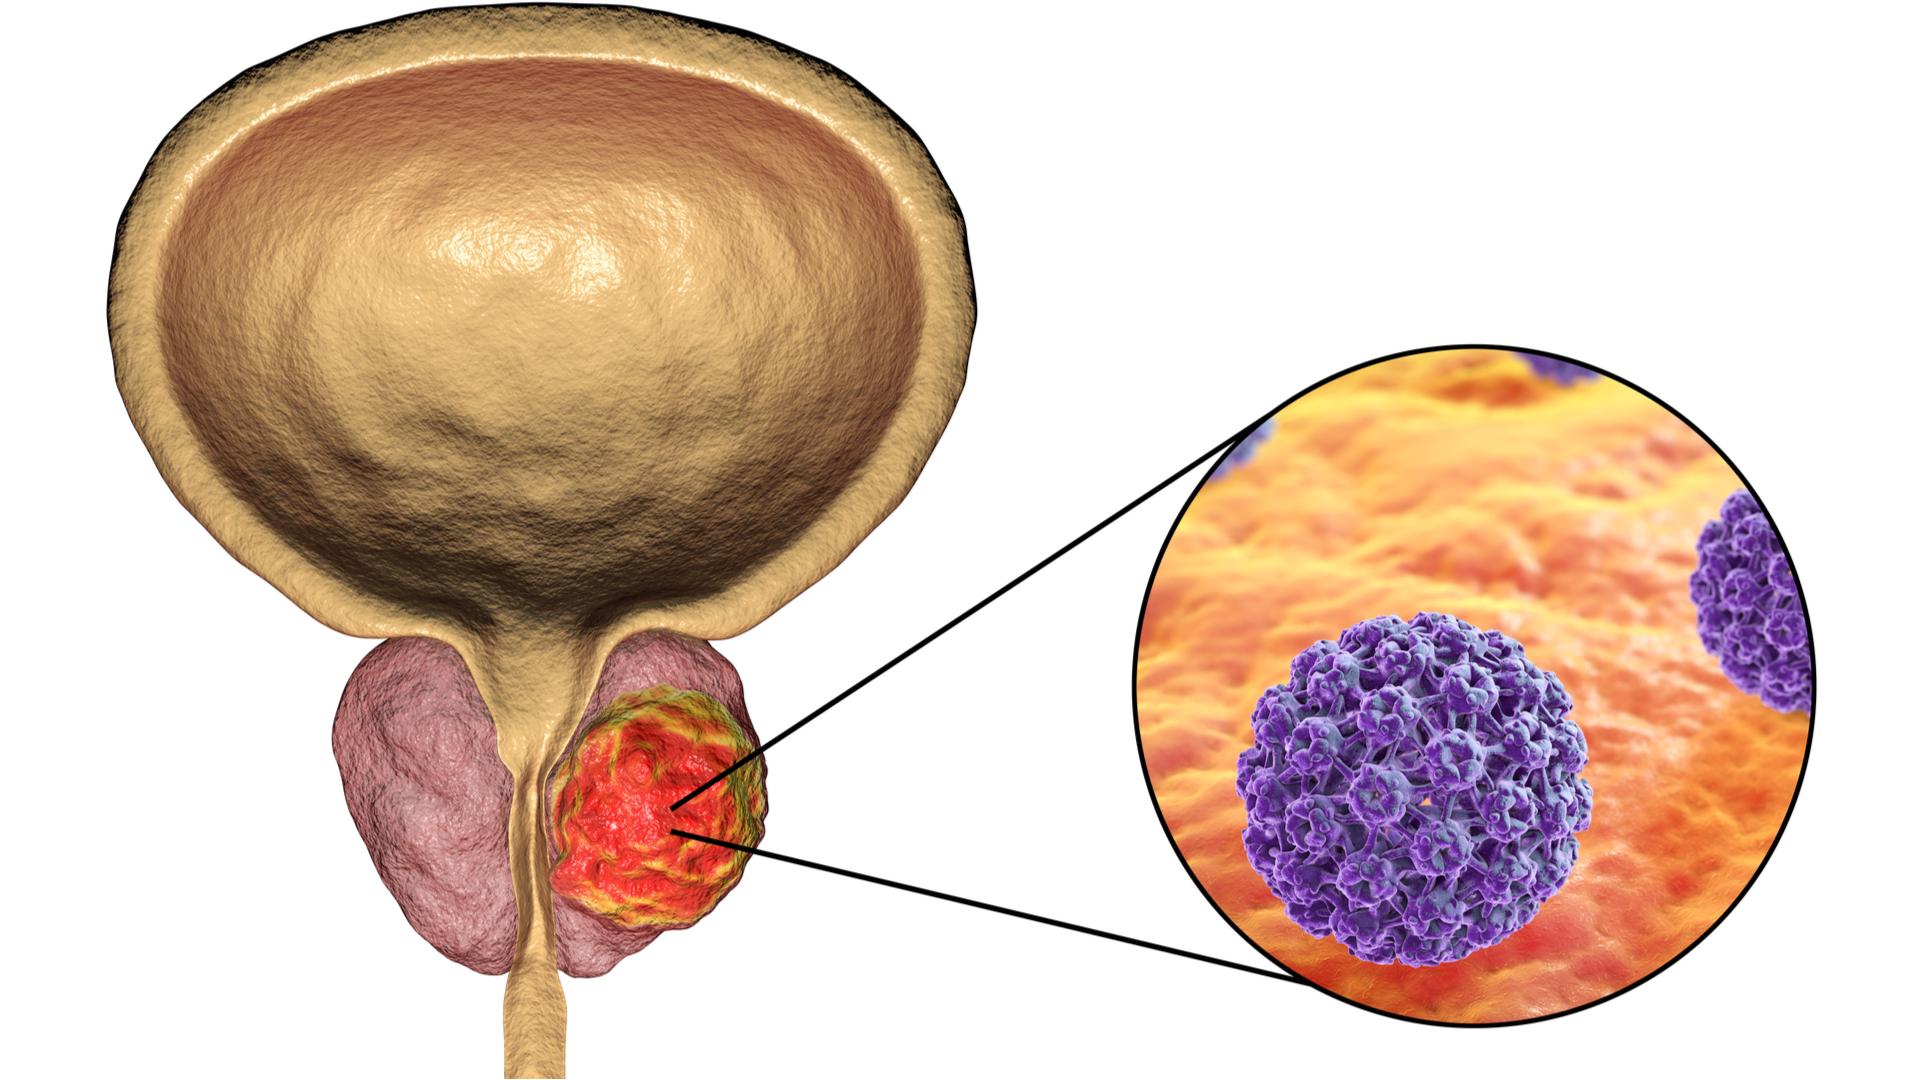 sintomas del cancer de prostata